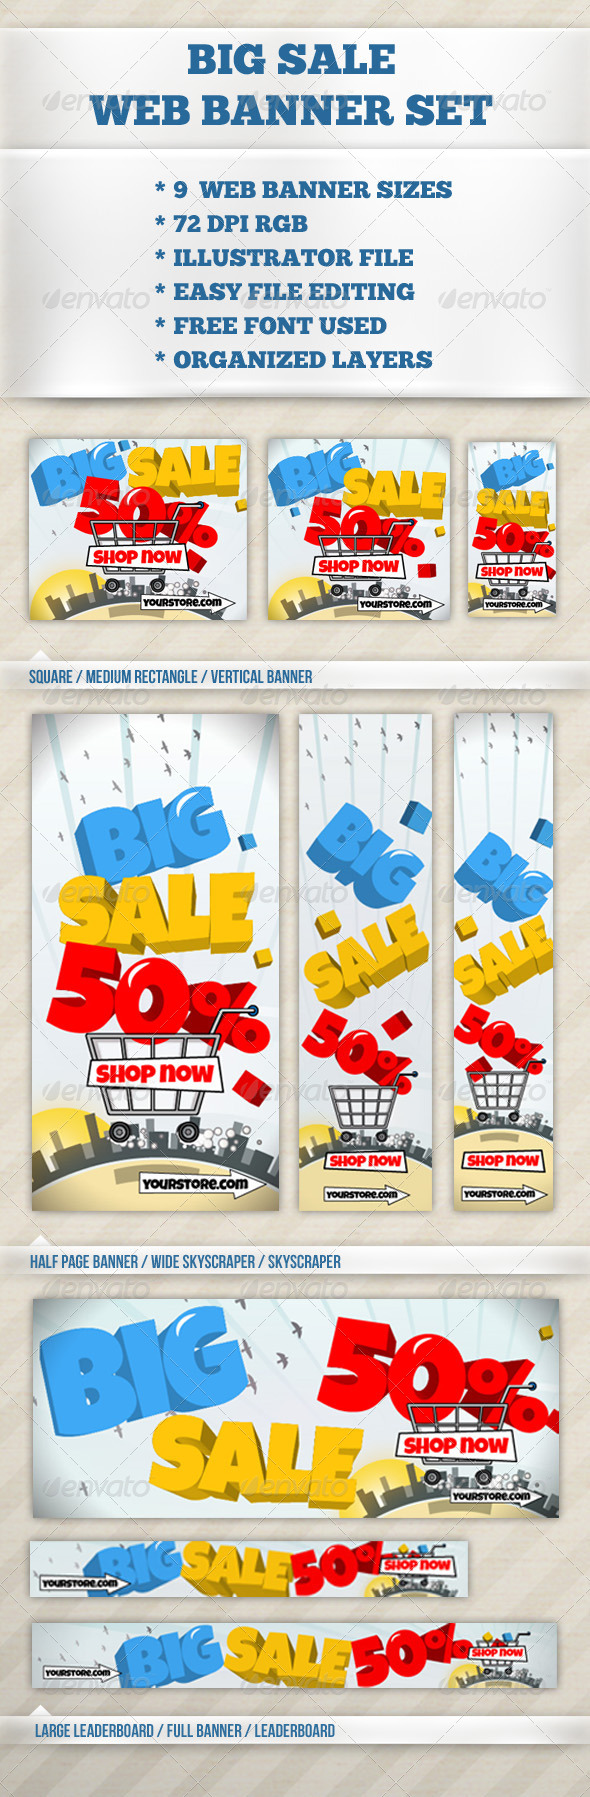 GraphicRiver Big Sale Web Banner 6544511